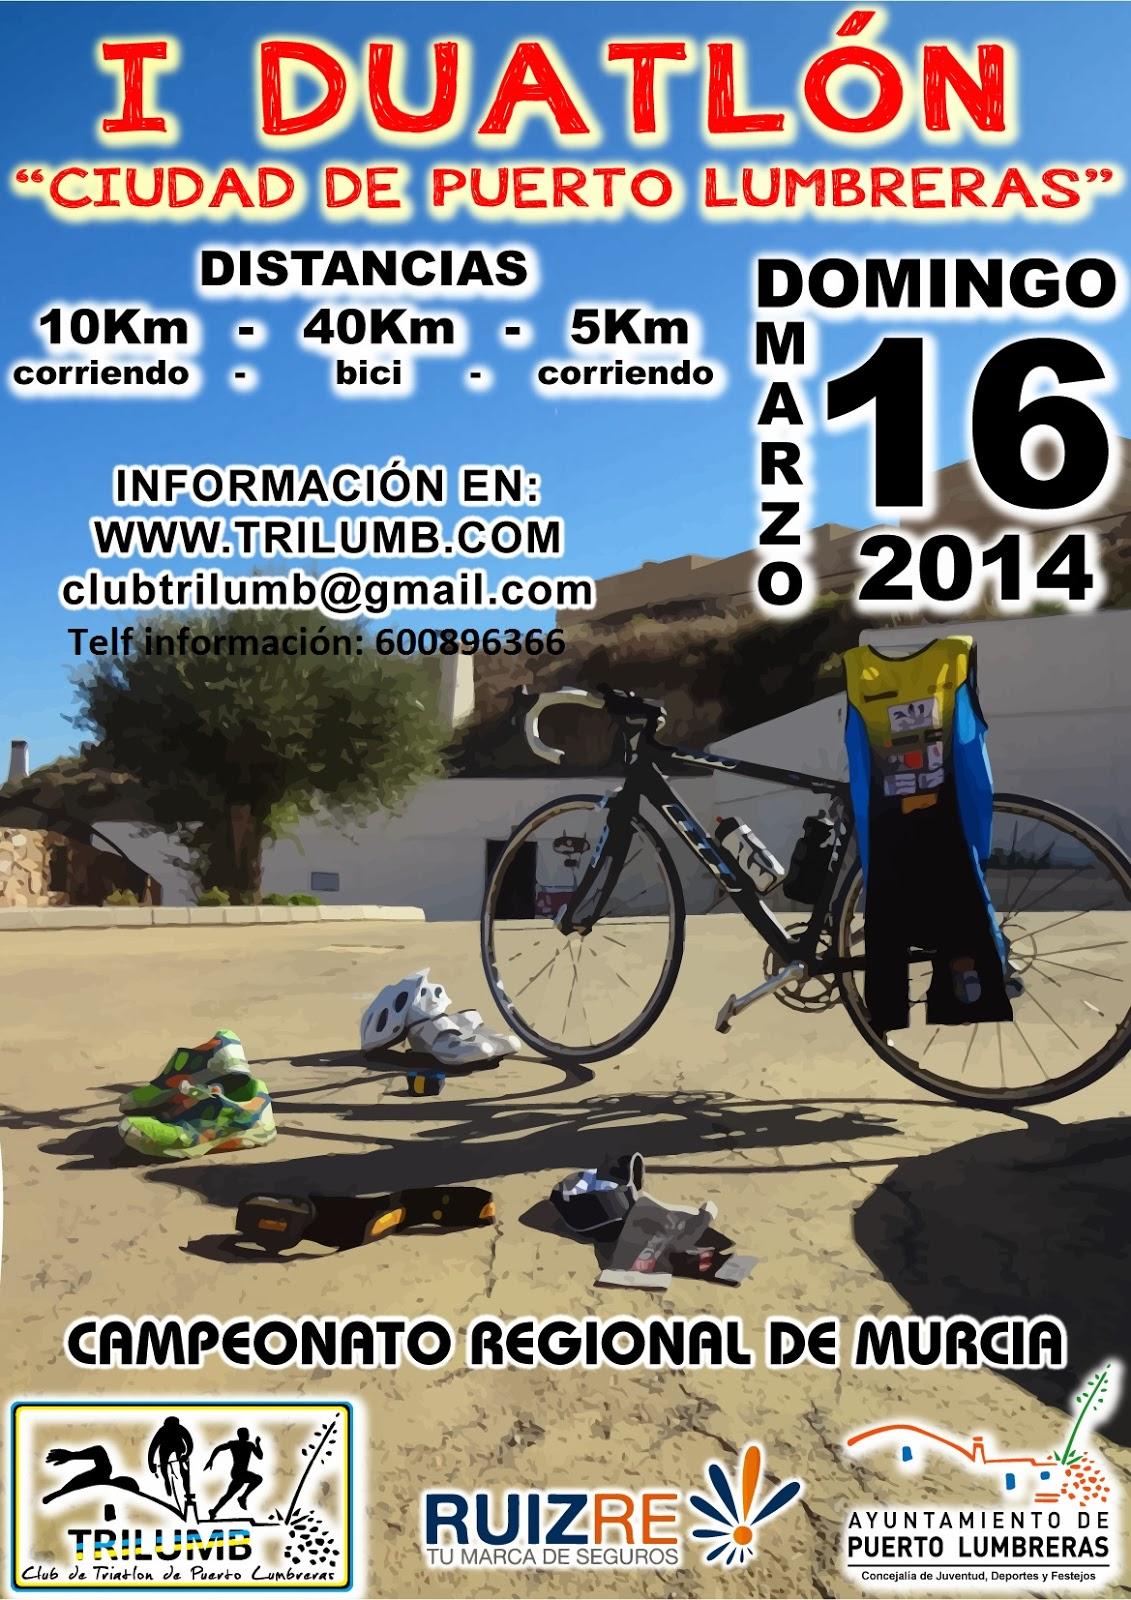 http://www.trimurcia.org/2014_dpuertolumbreras.asp